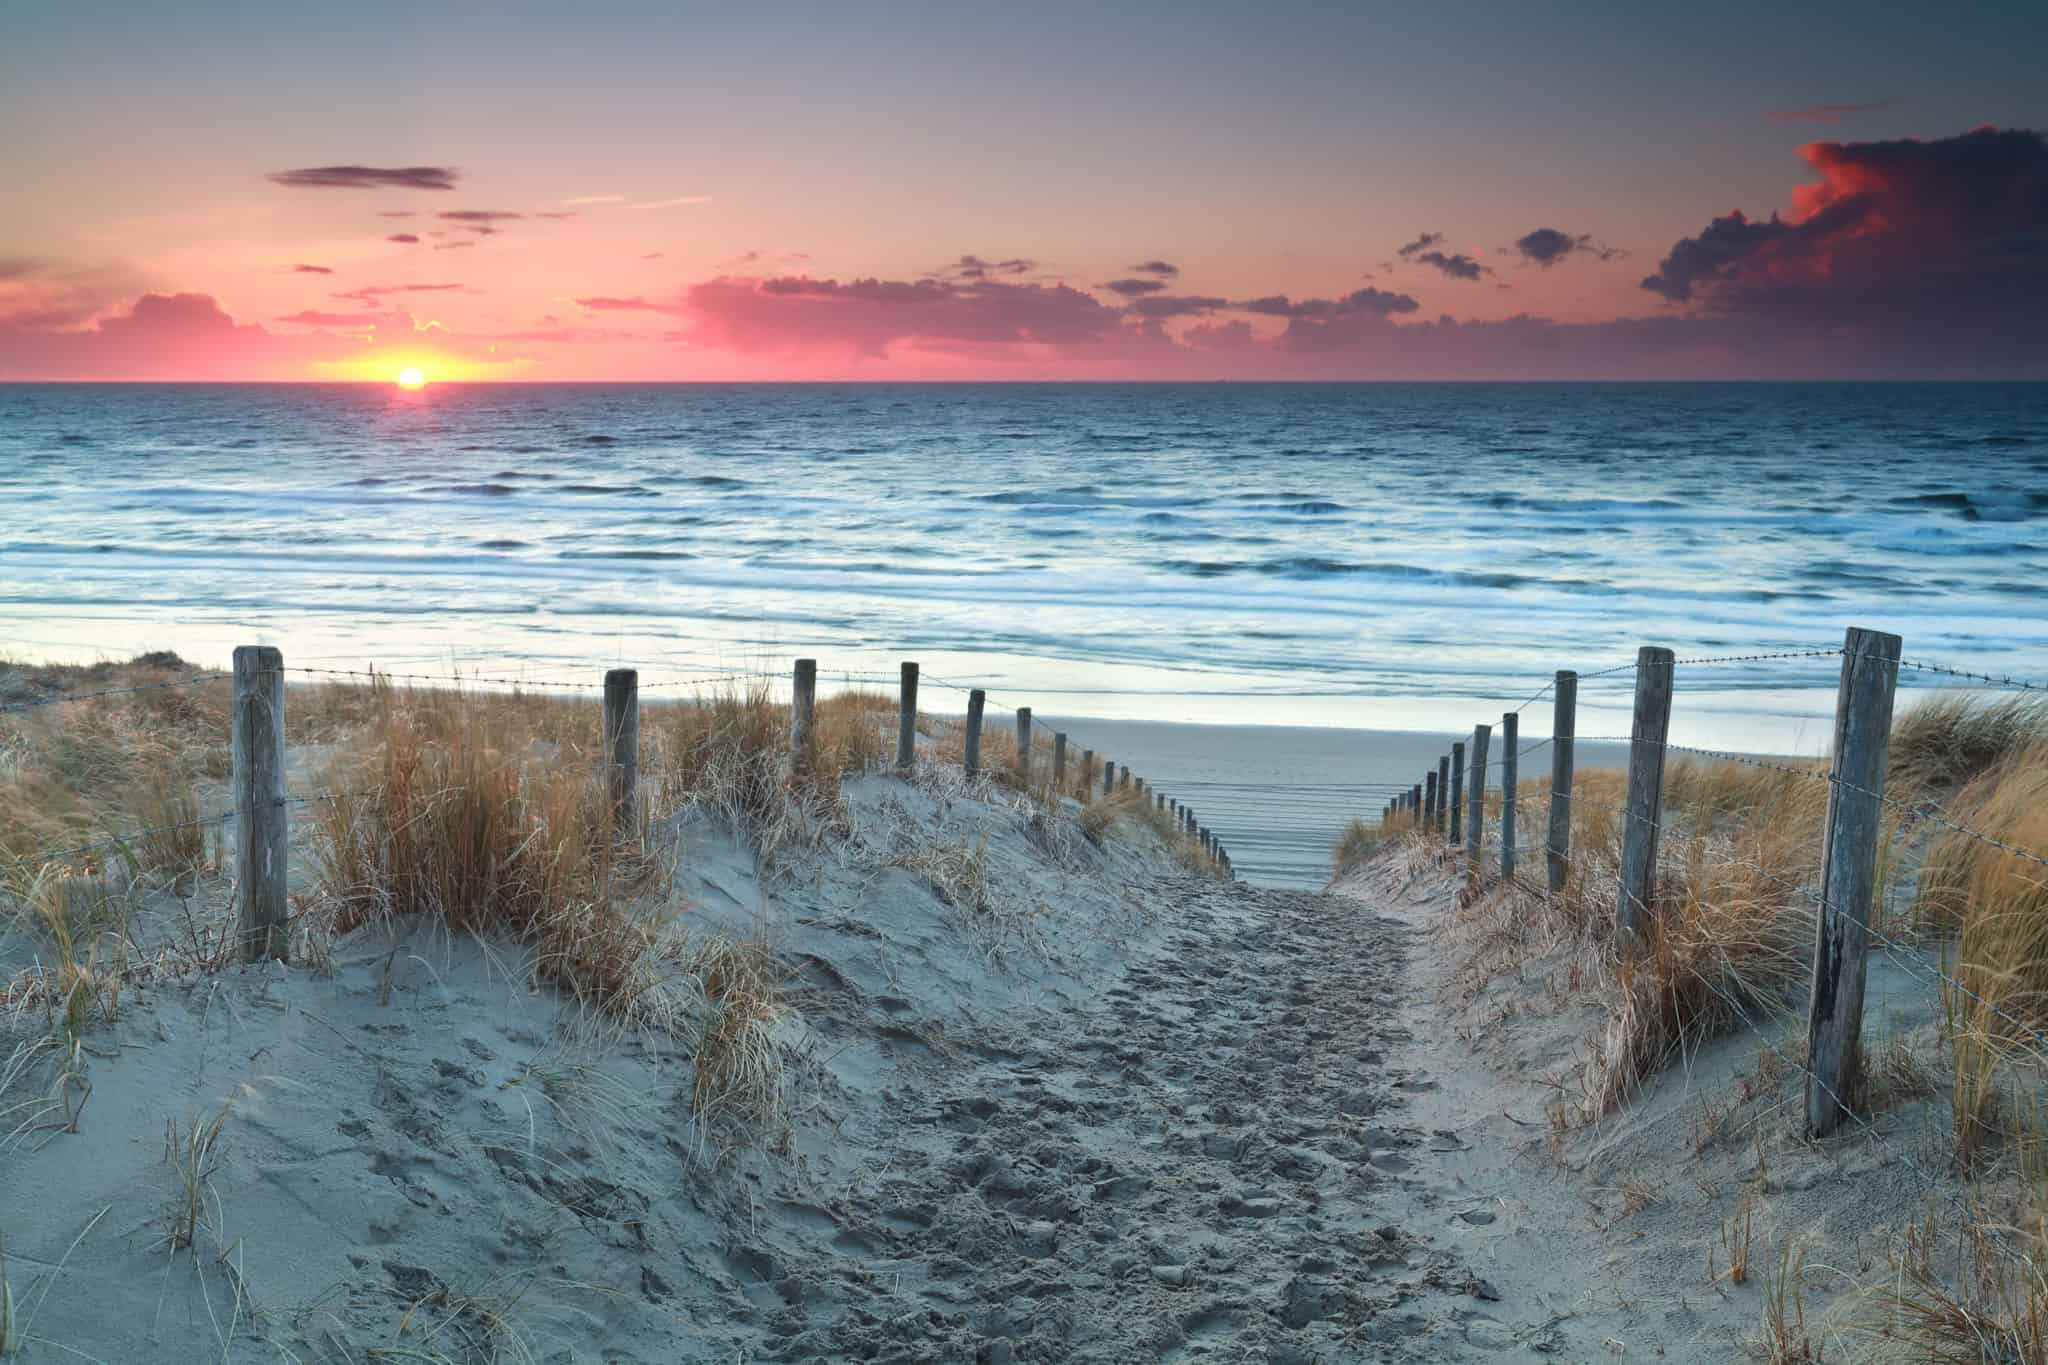 Sonnenuntergang am Strand bei Zandvoort